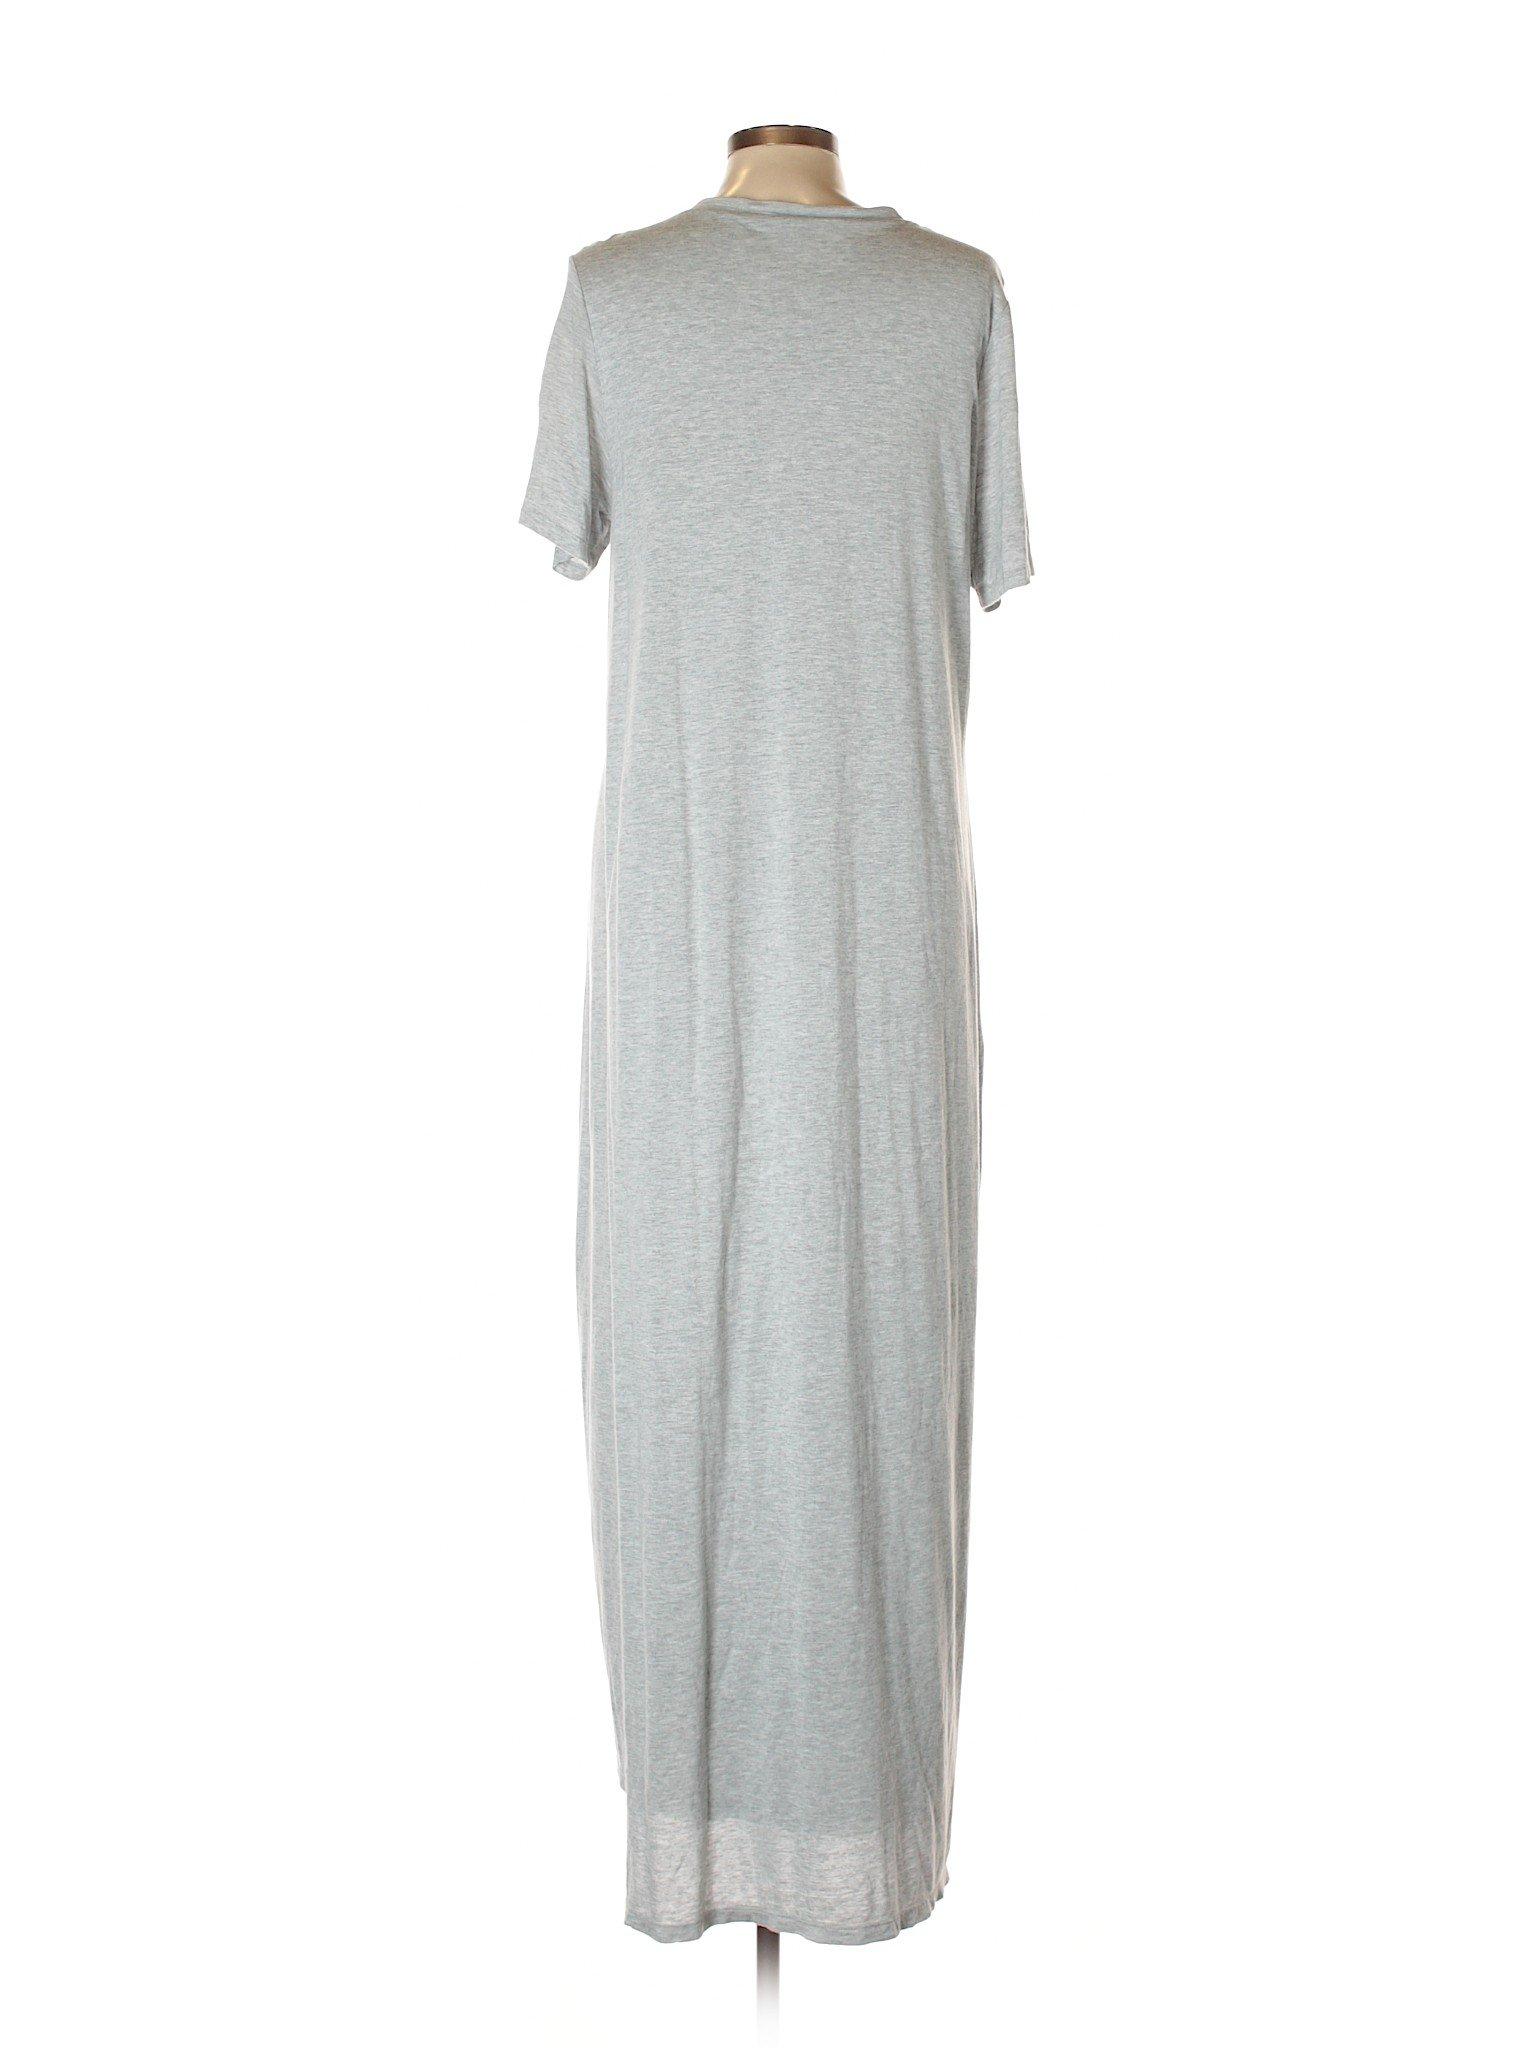 Who Dress Selling Wear Casual What UxXBBqd